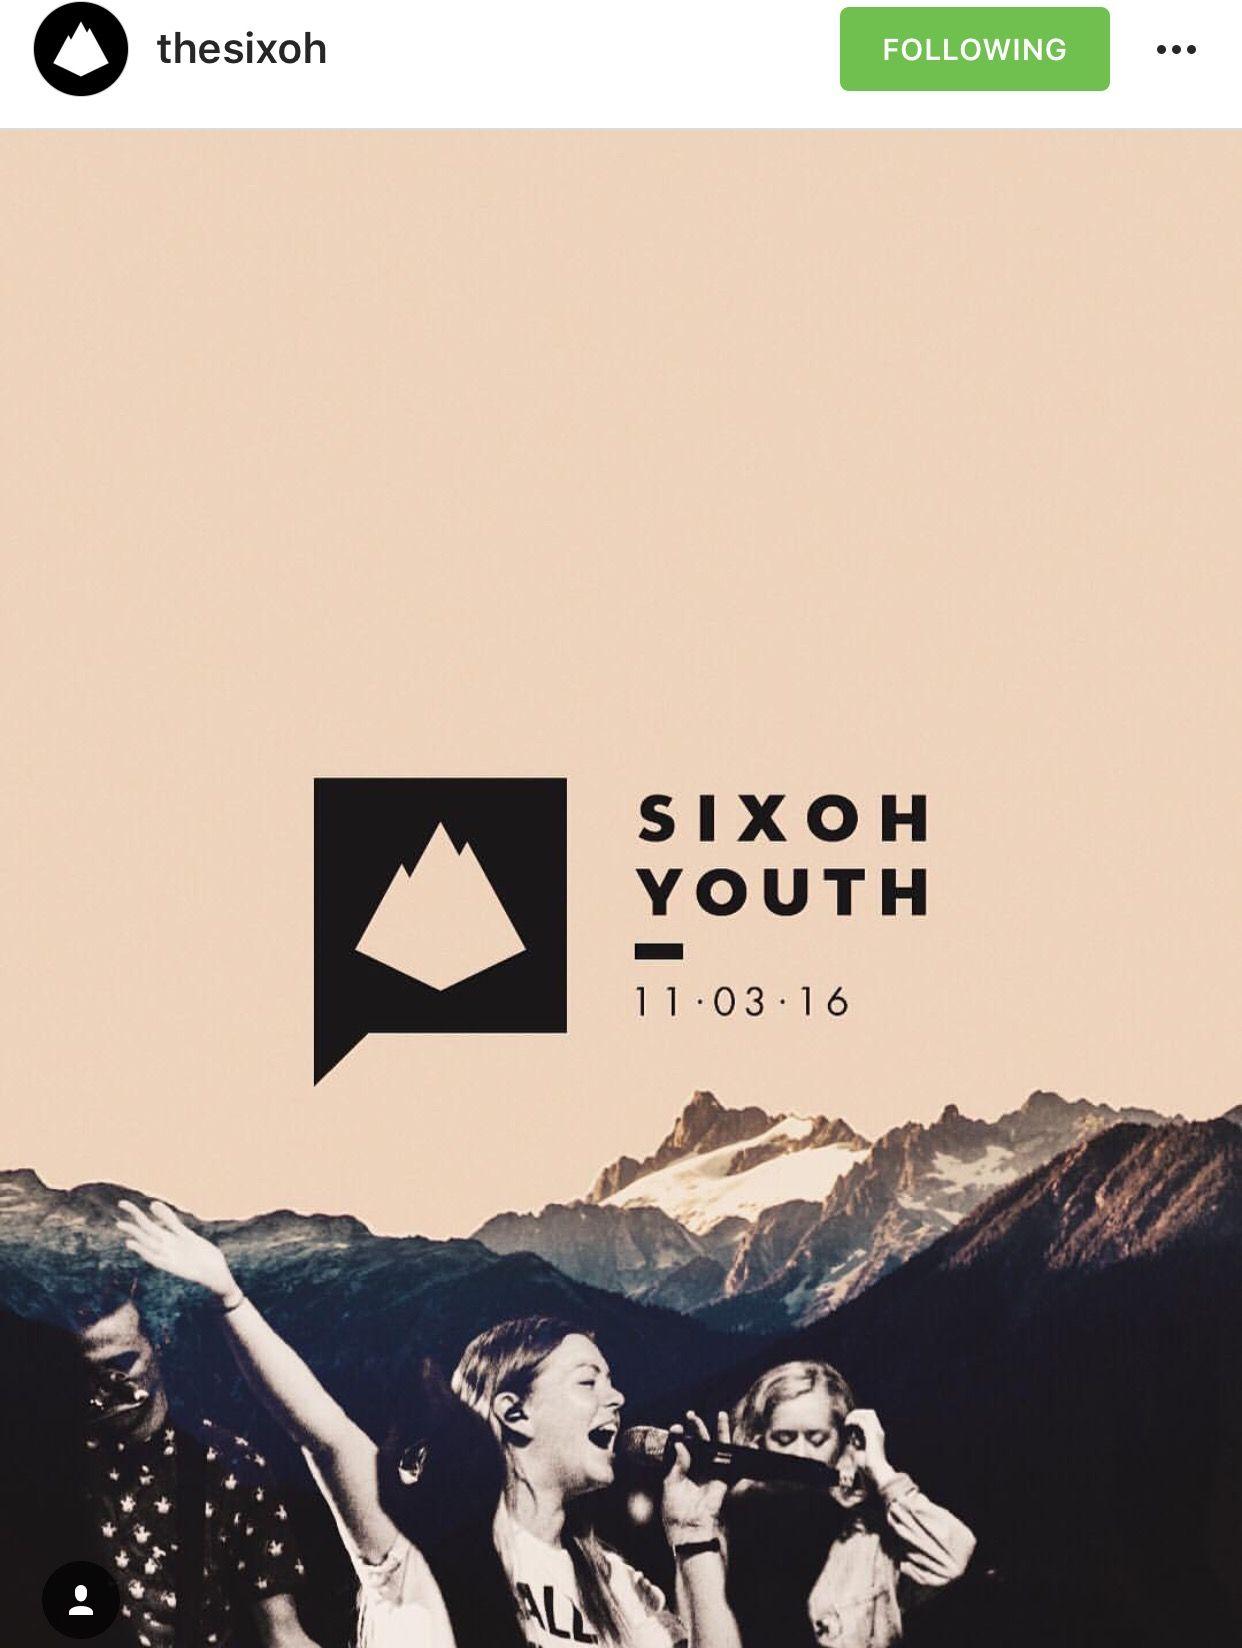 Pin by pjon on H2O Logo Design Logos design, Poster, Art